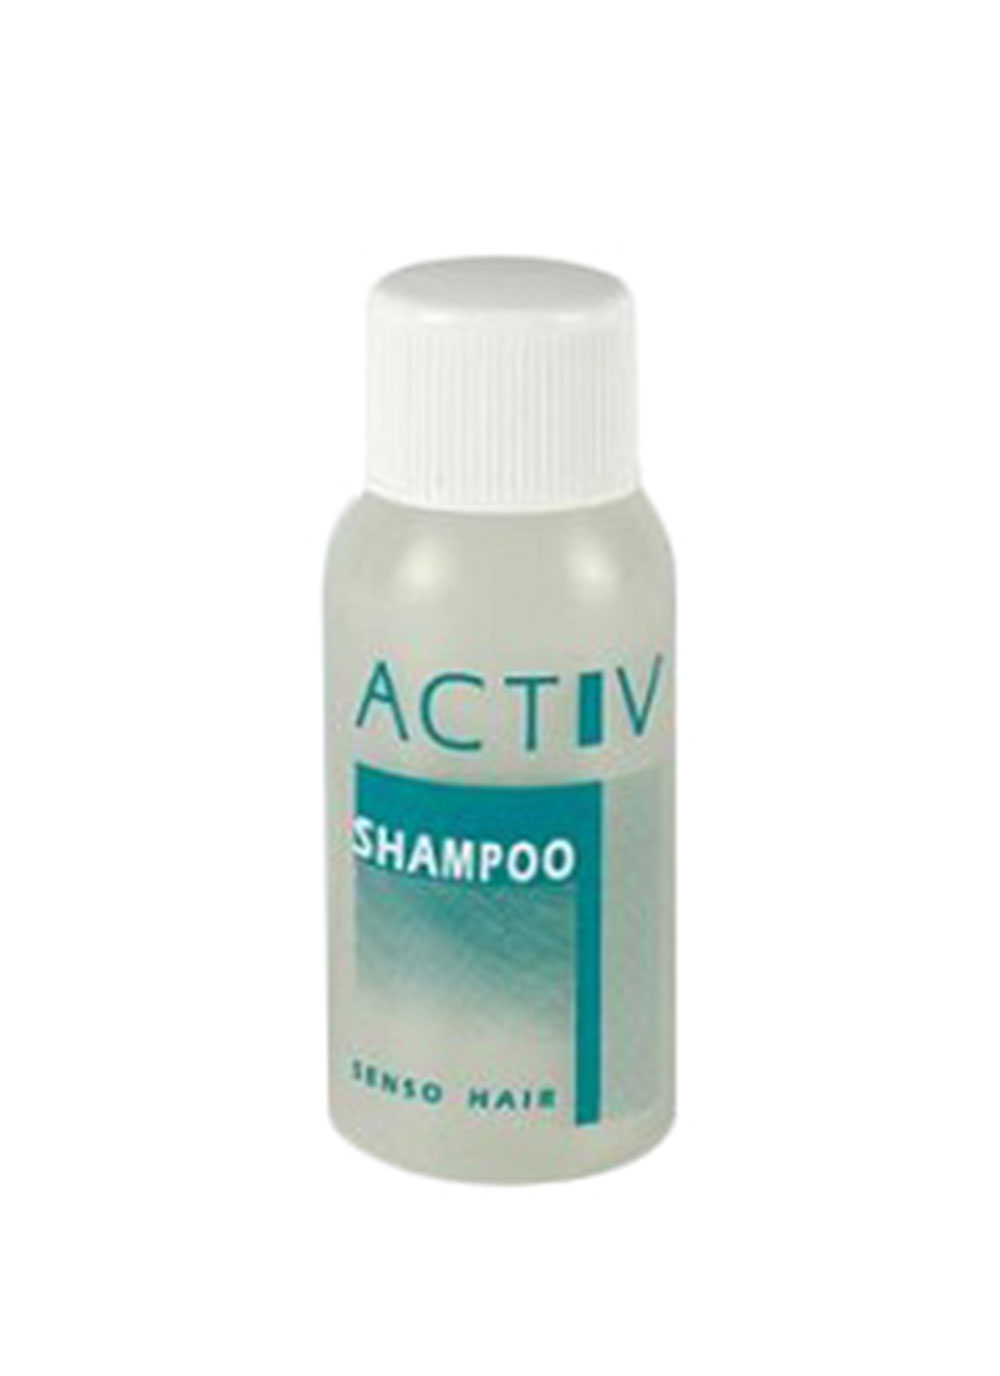 GFH Zubehör - Activ Shampoo Kunsthaar 50 ml